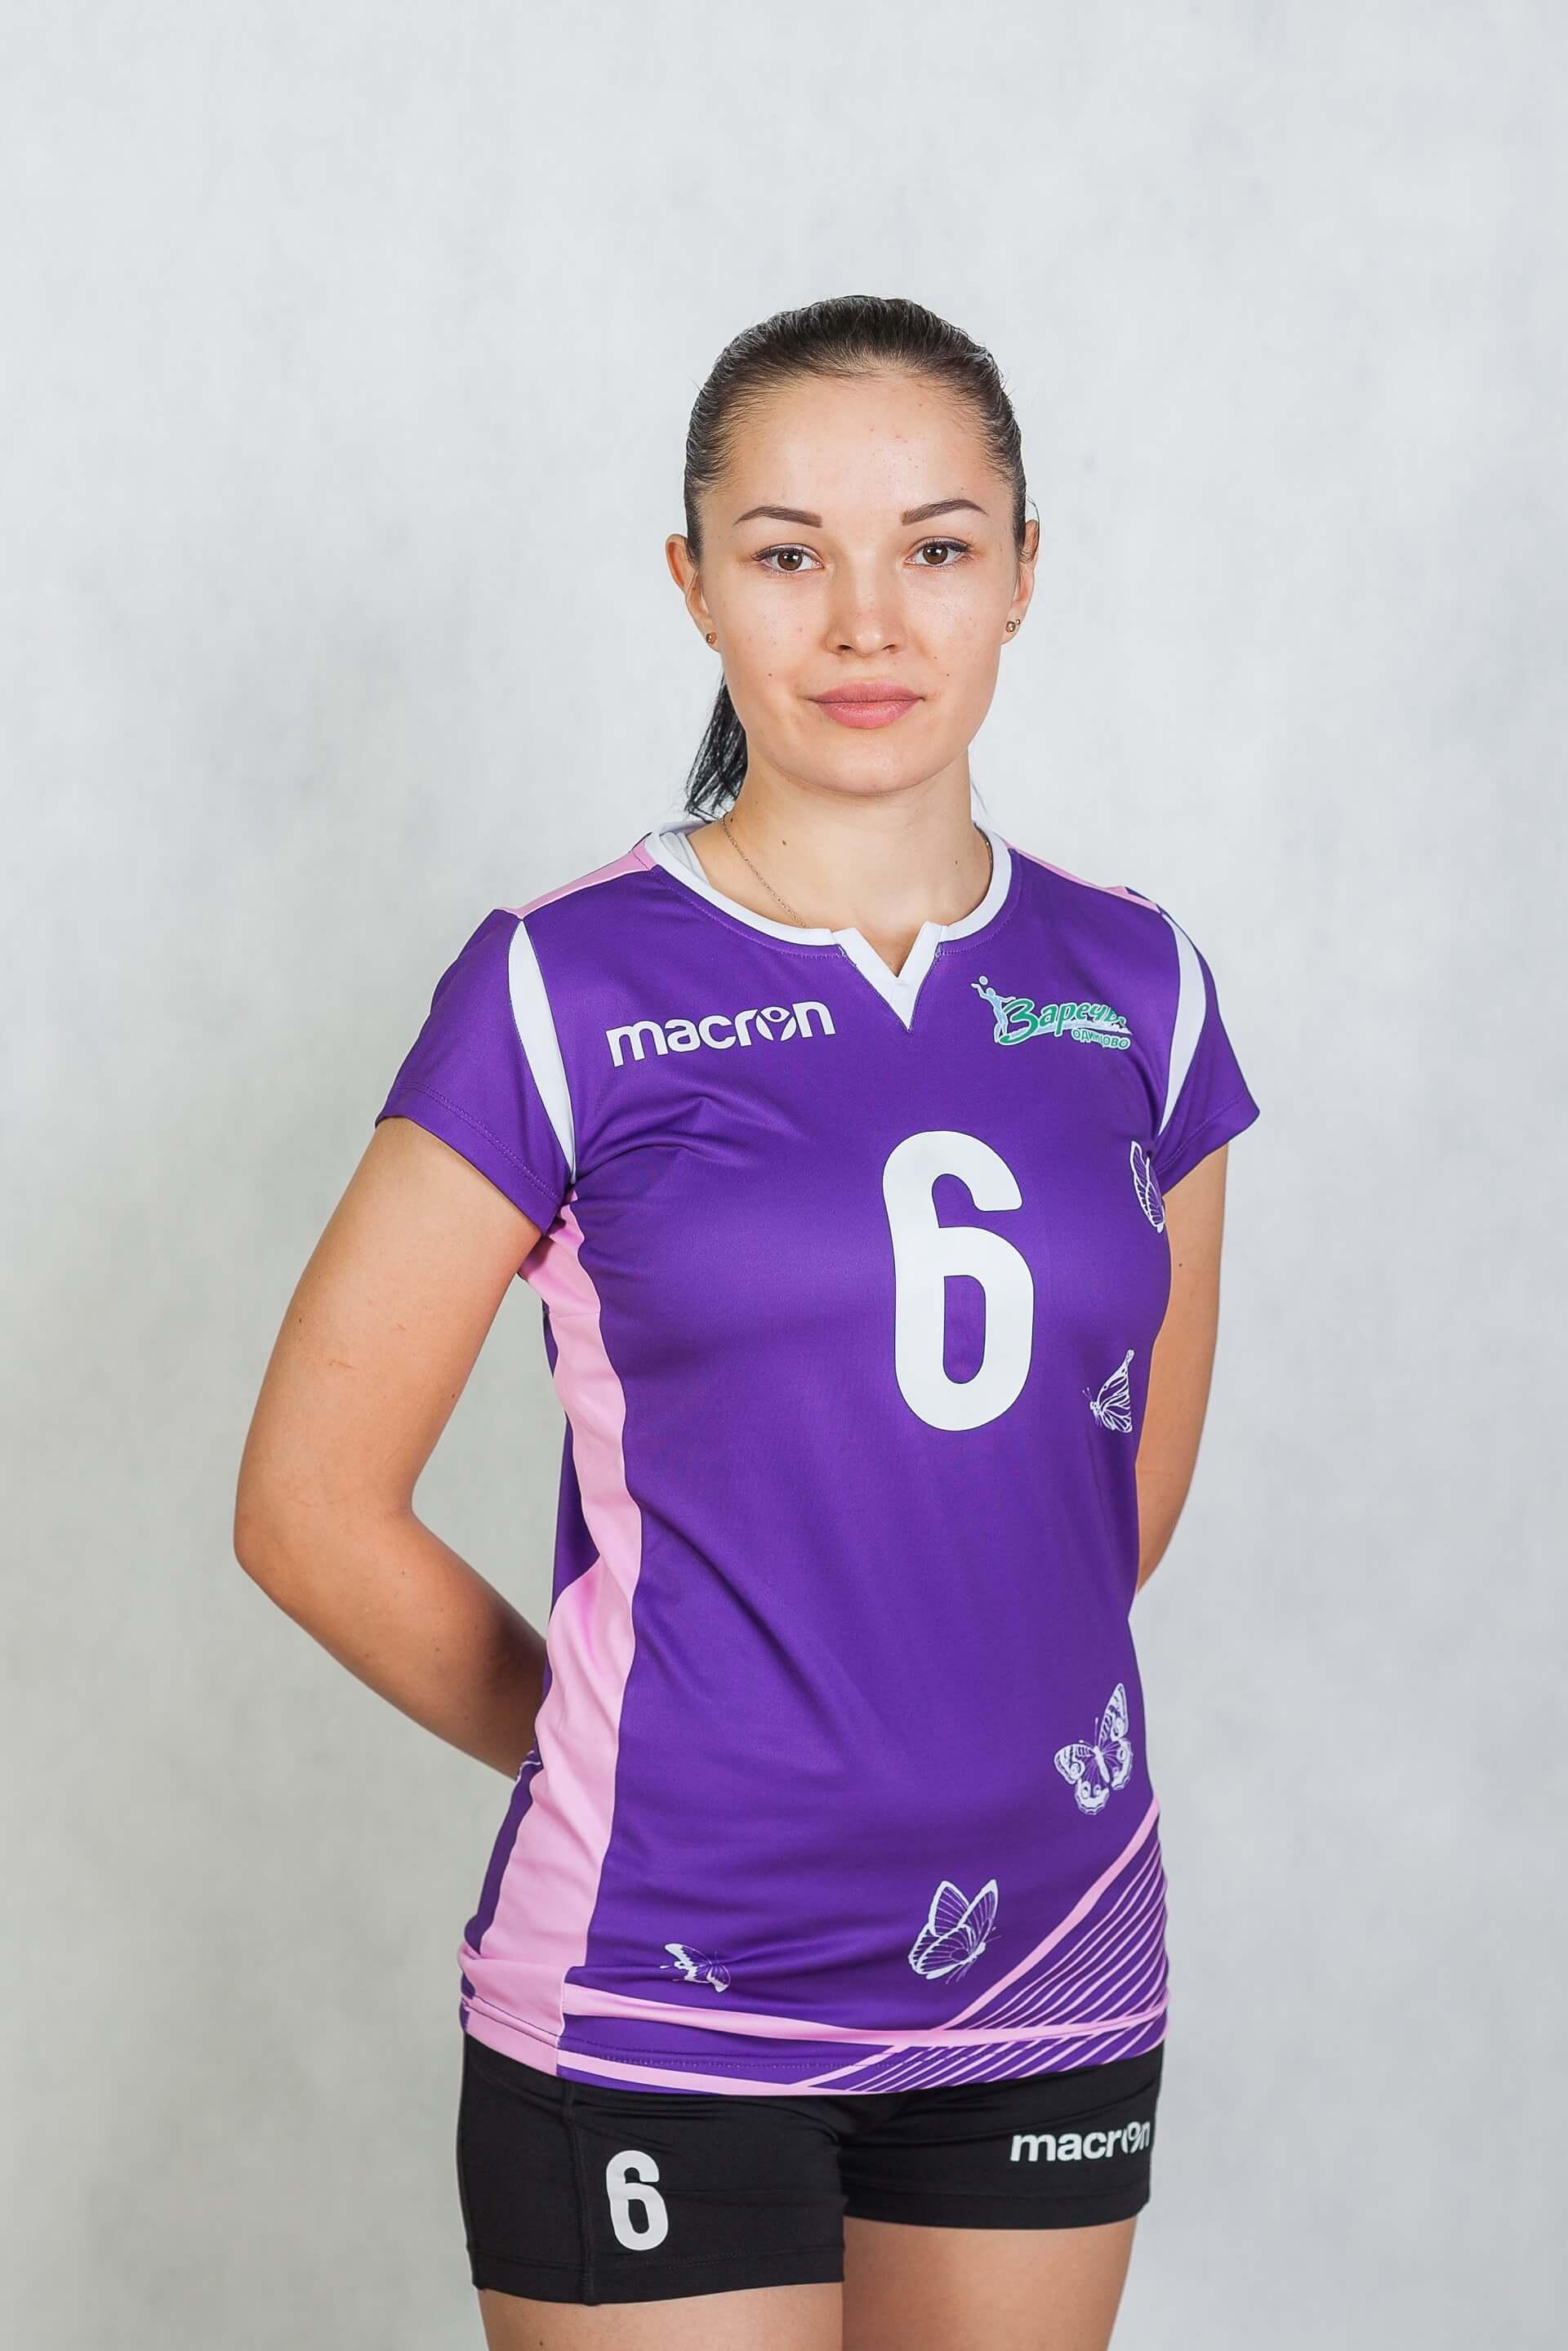 06-kurnosova